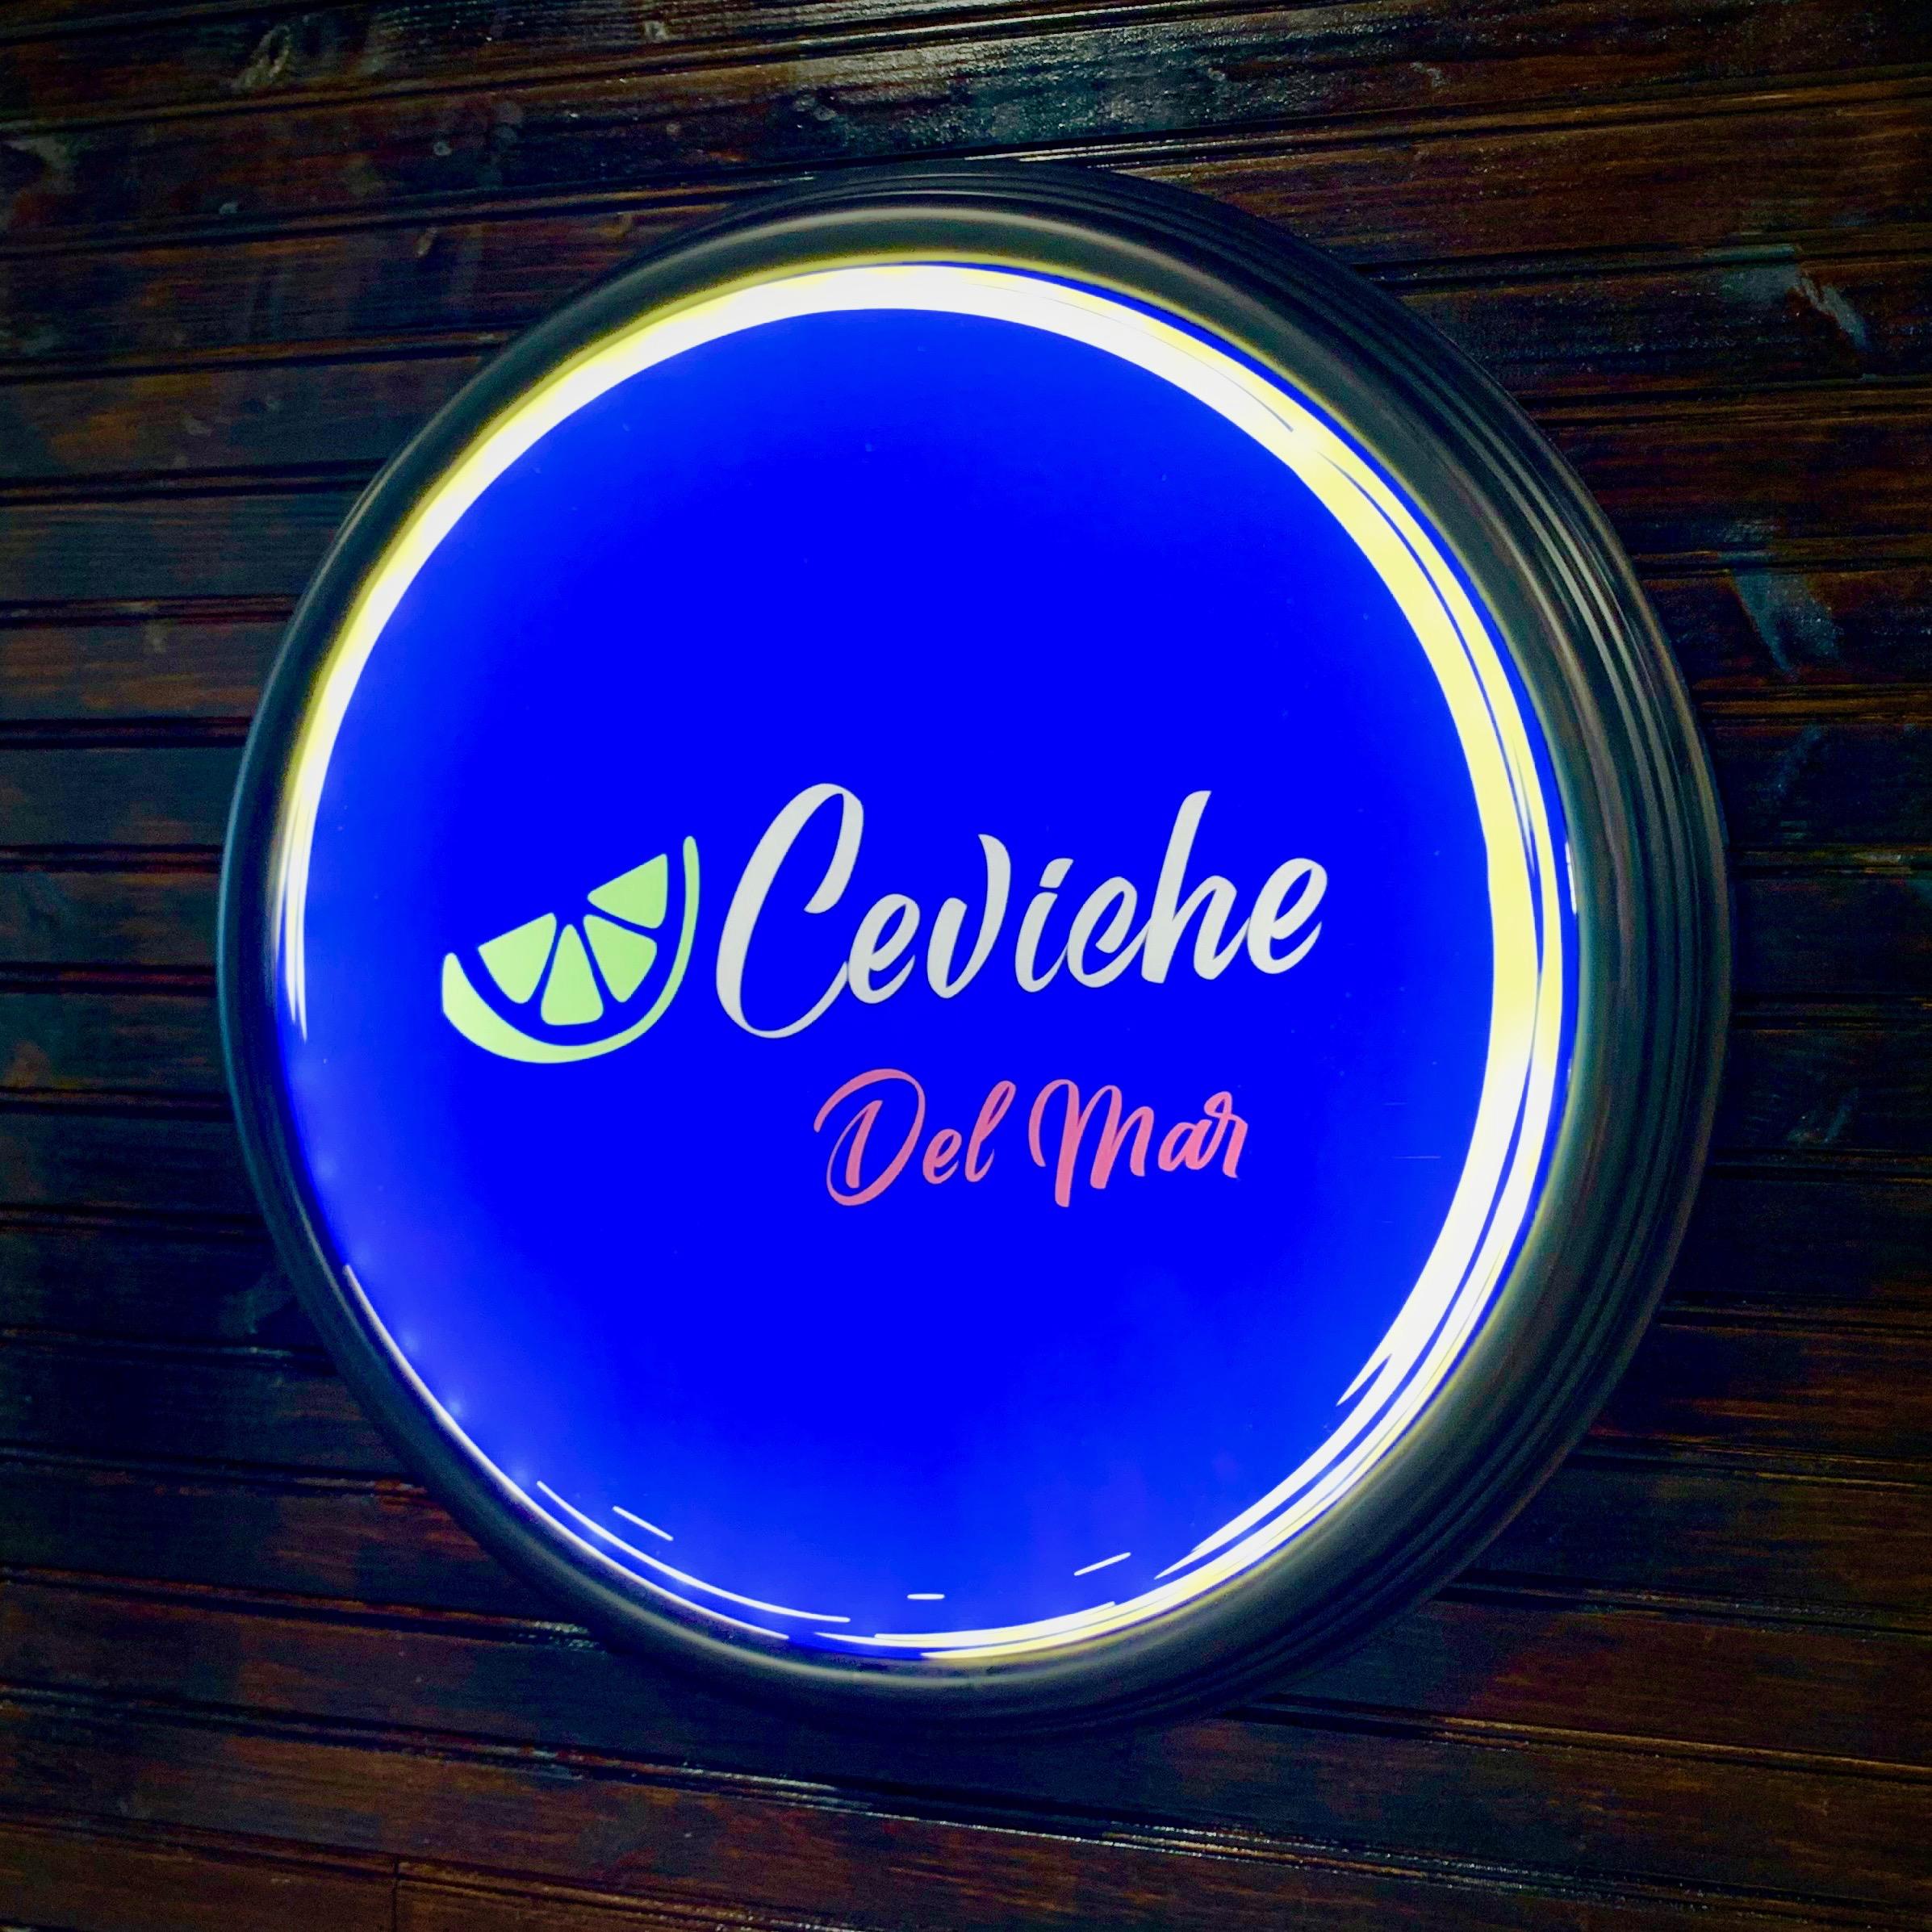 Ceviche Del Mar Now Open!